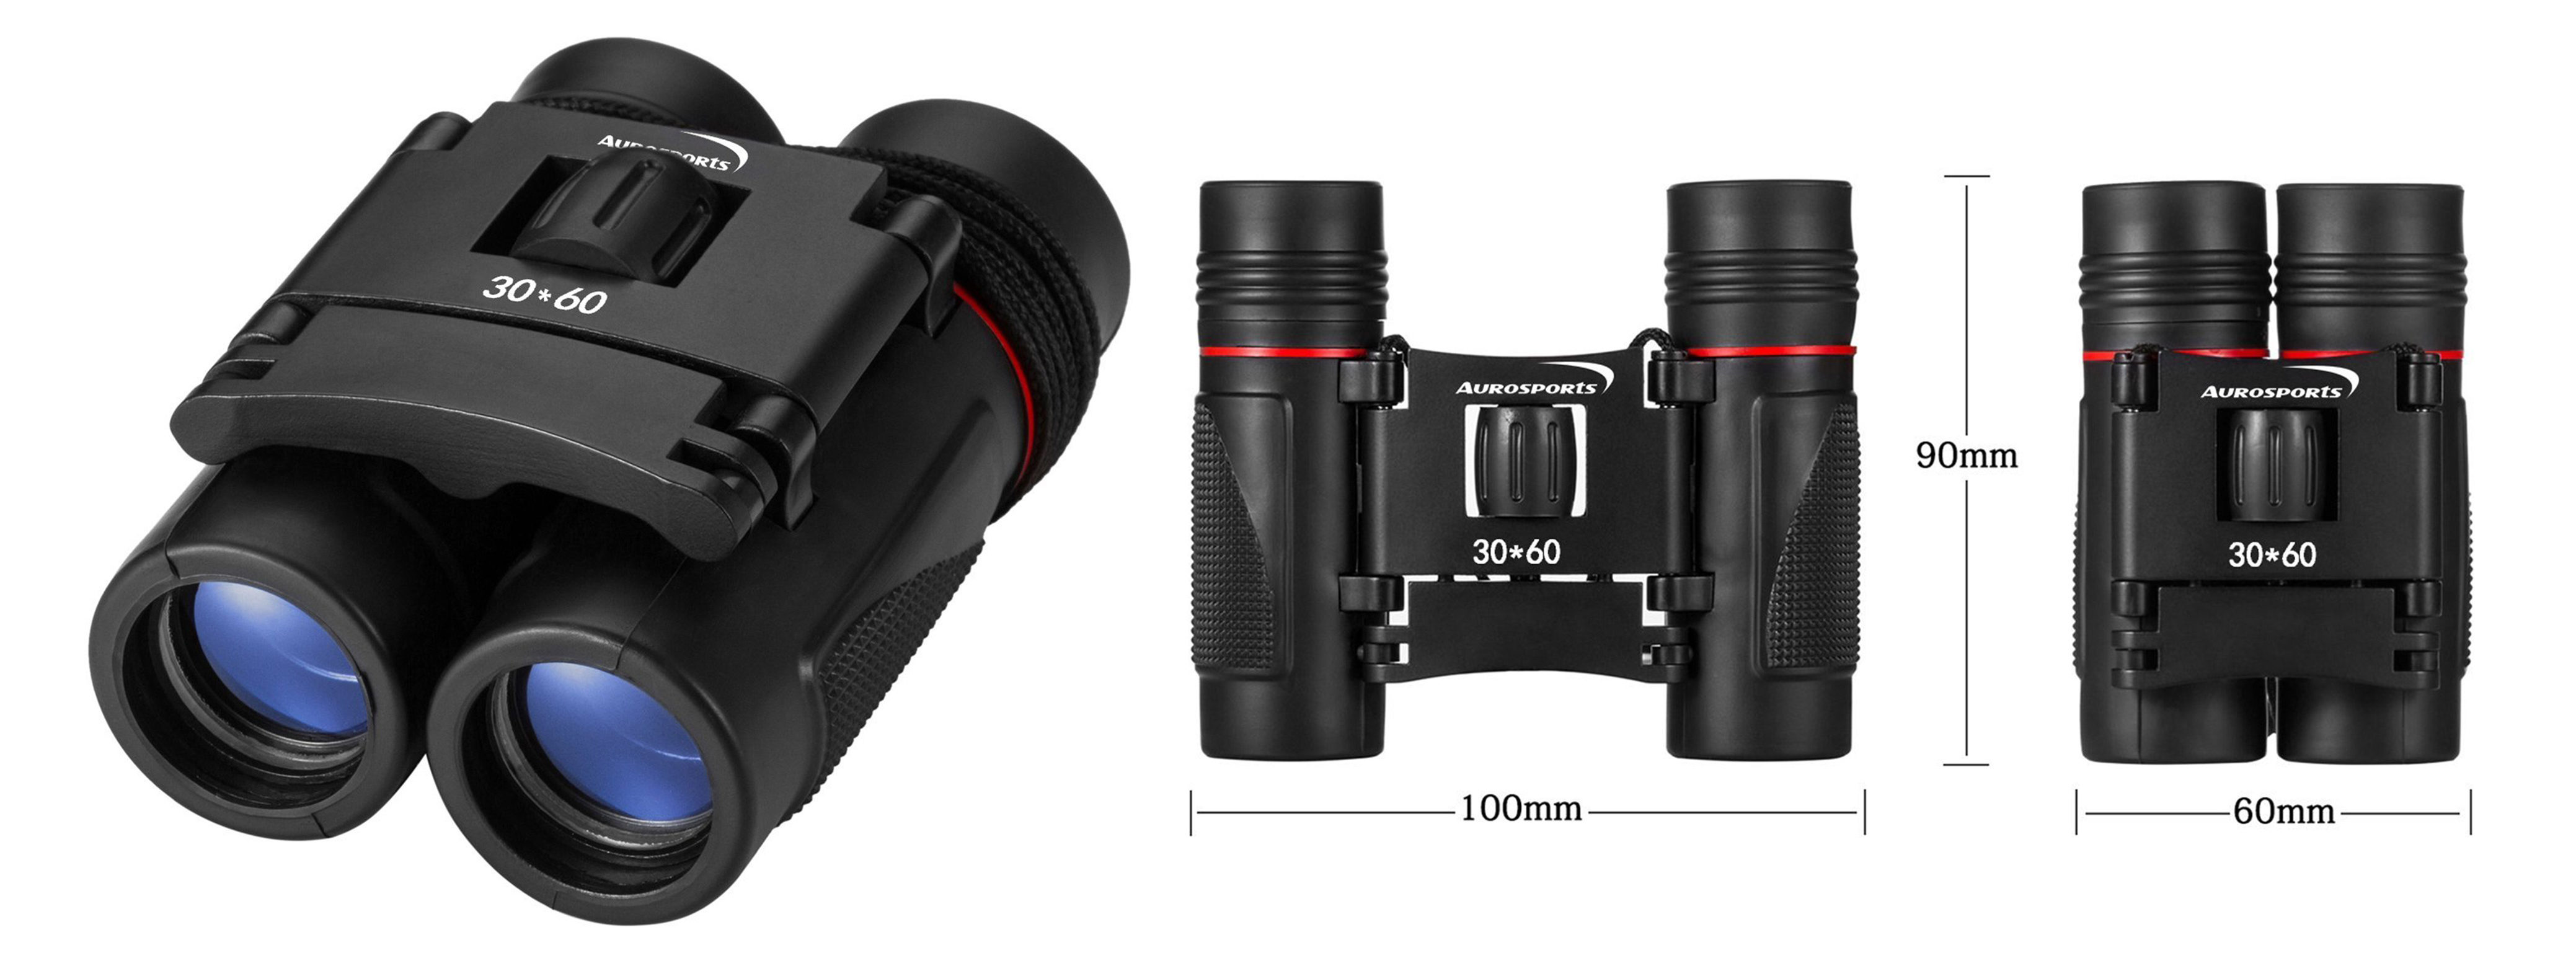 Aurosports 30x60 Folding Binoculars Telescope with Low Light Night Vision